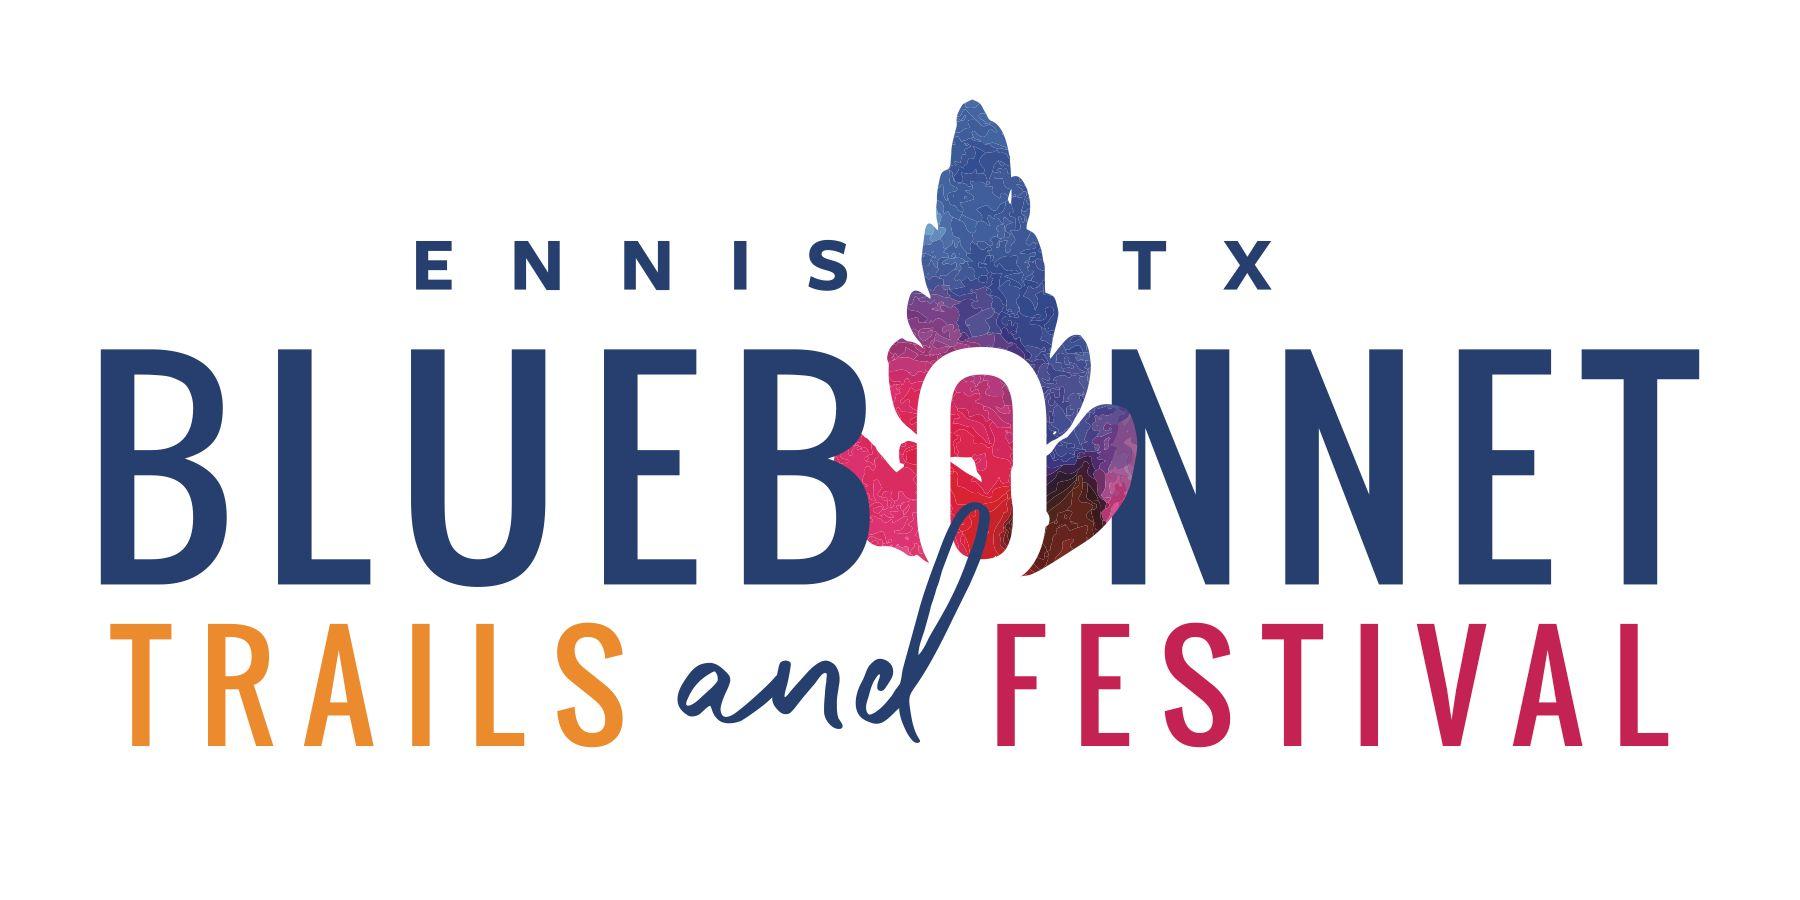 Ennis Bluebonnet logo